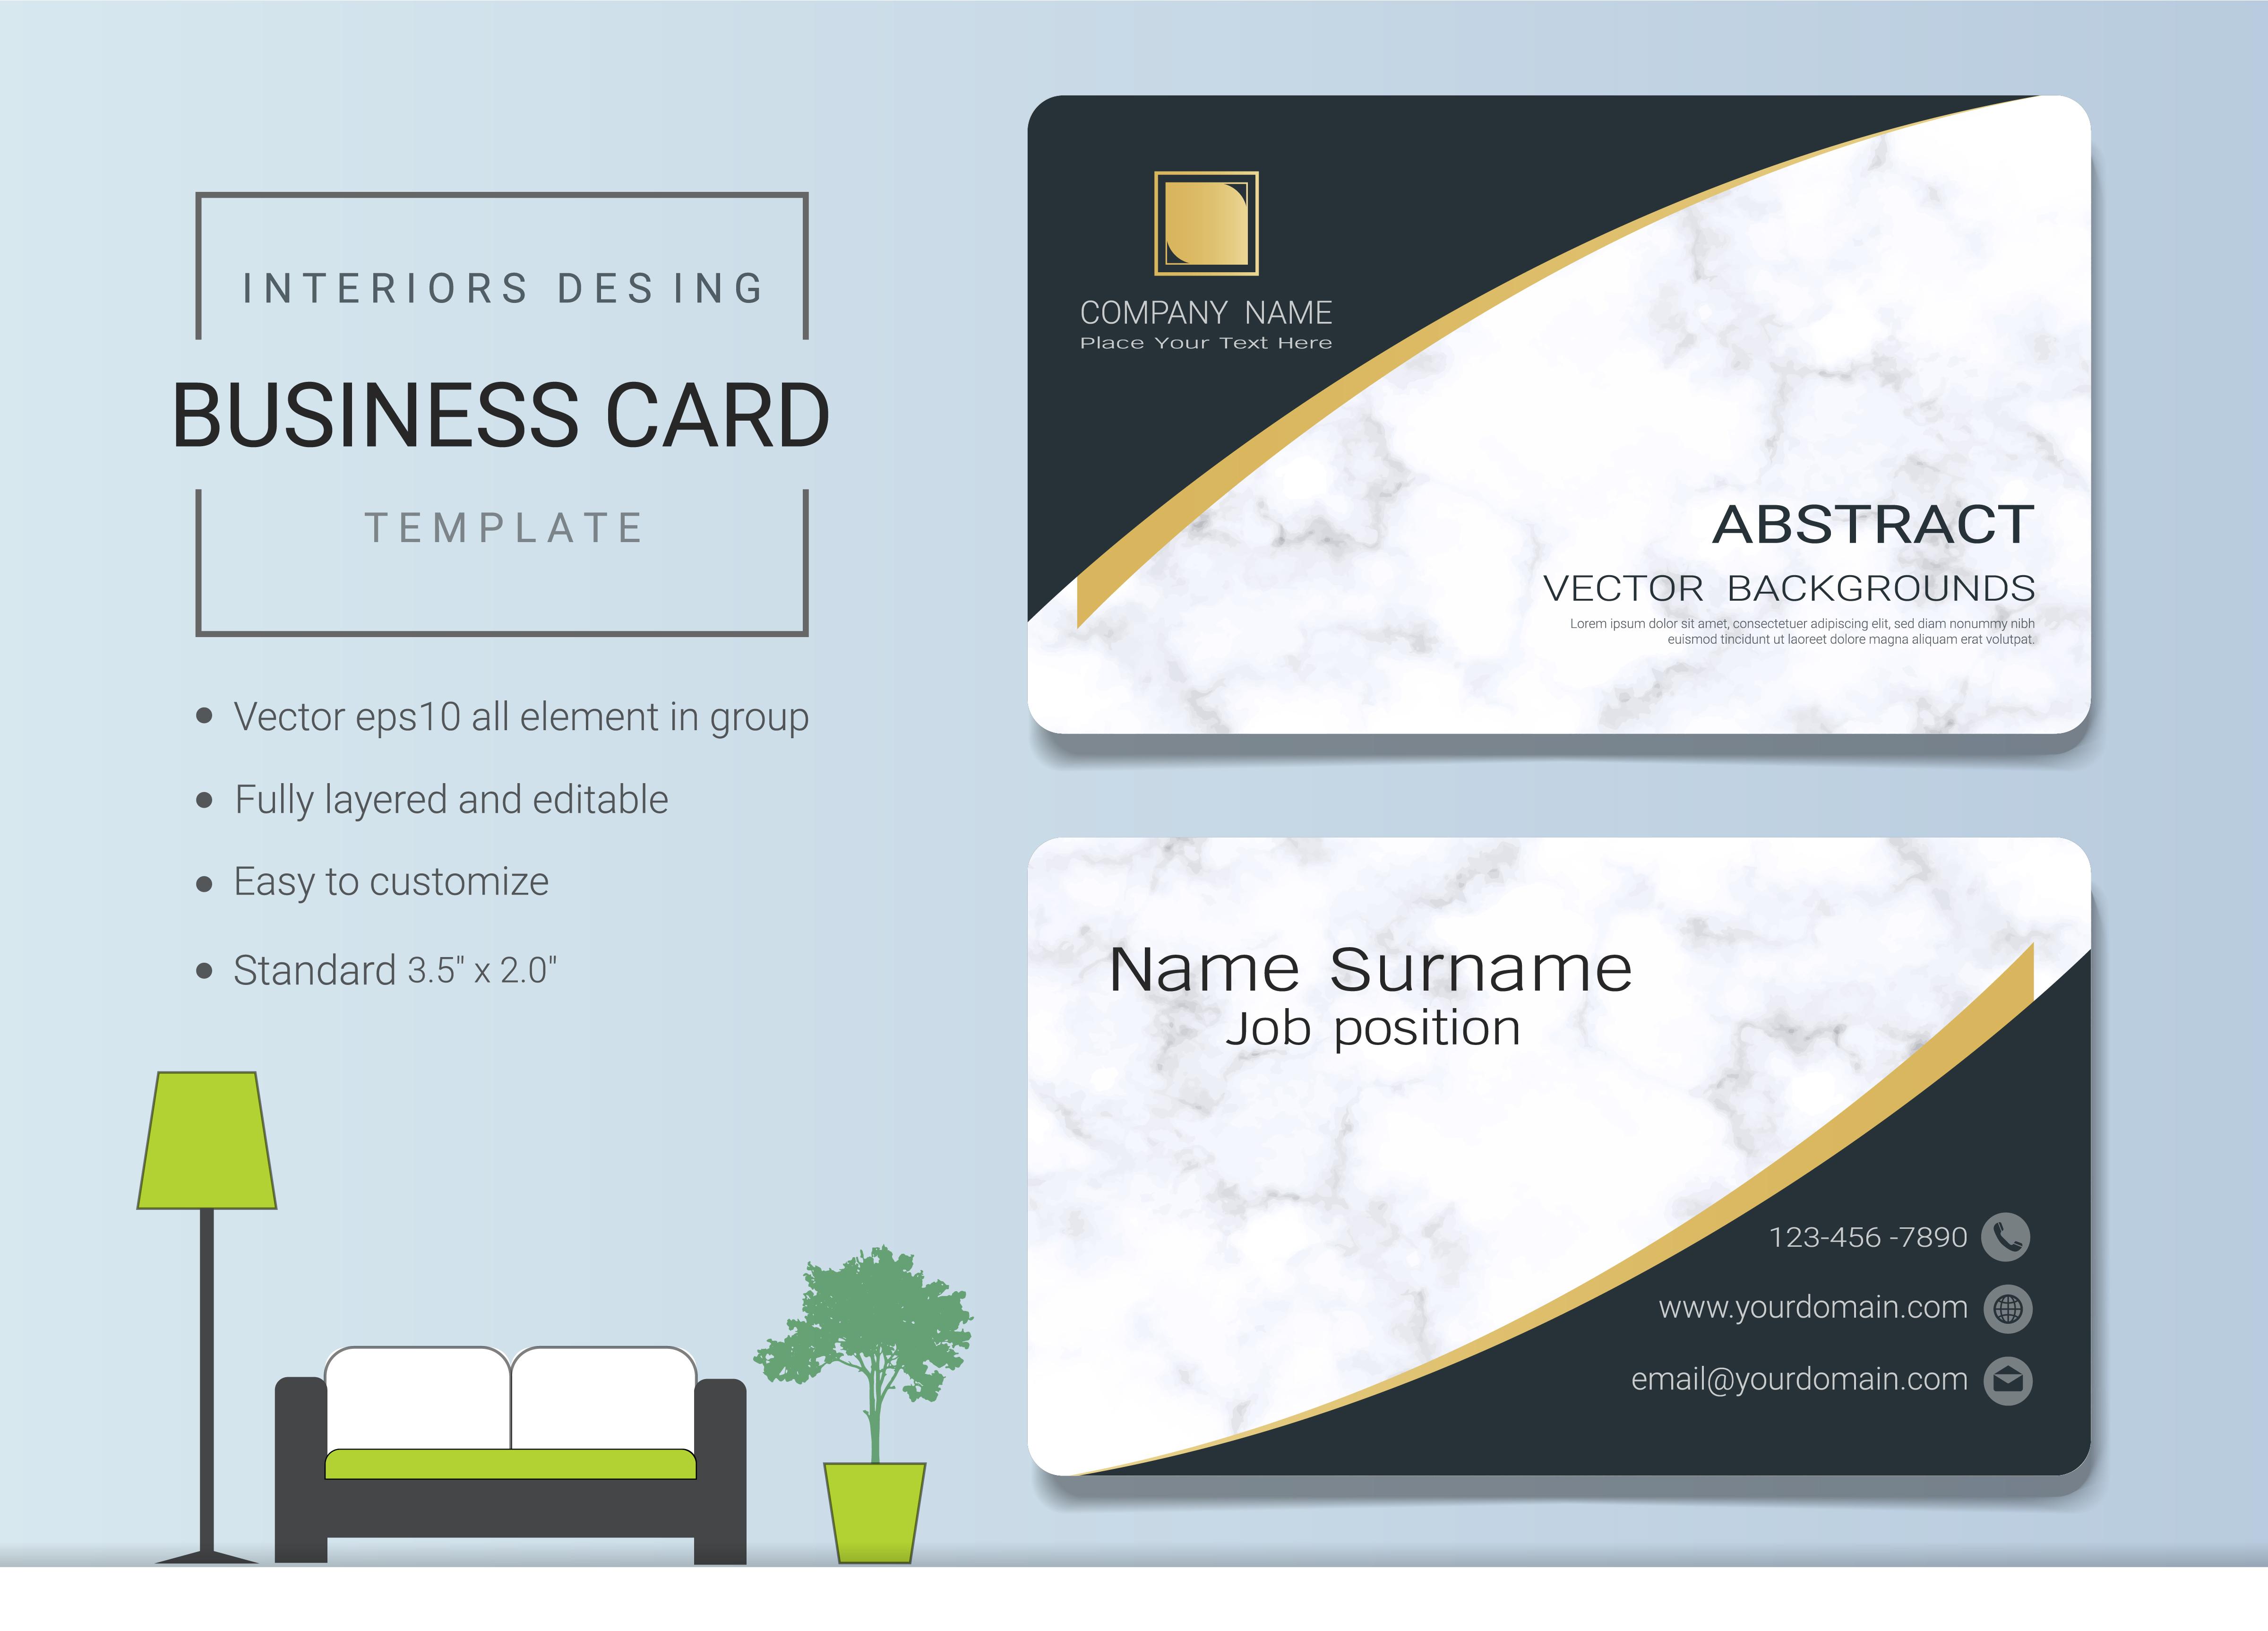 business name card template for interior designer 532157